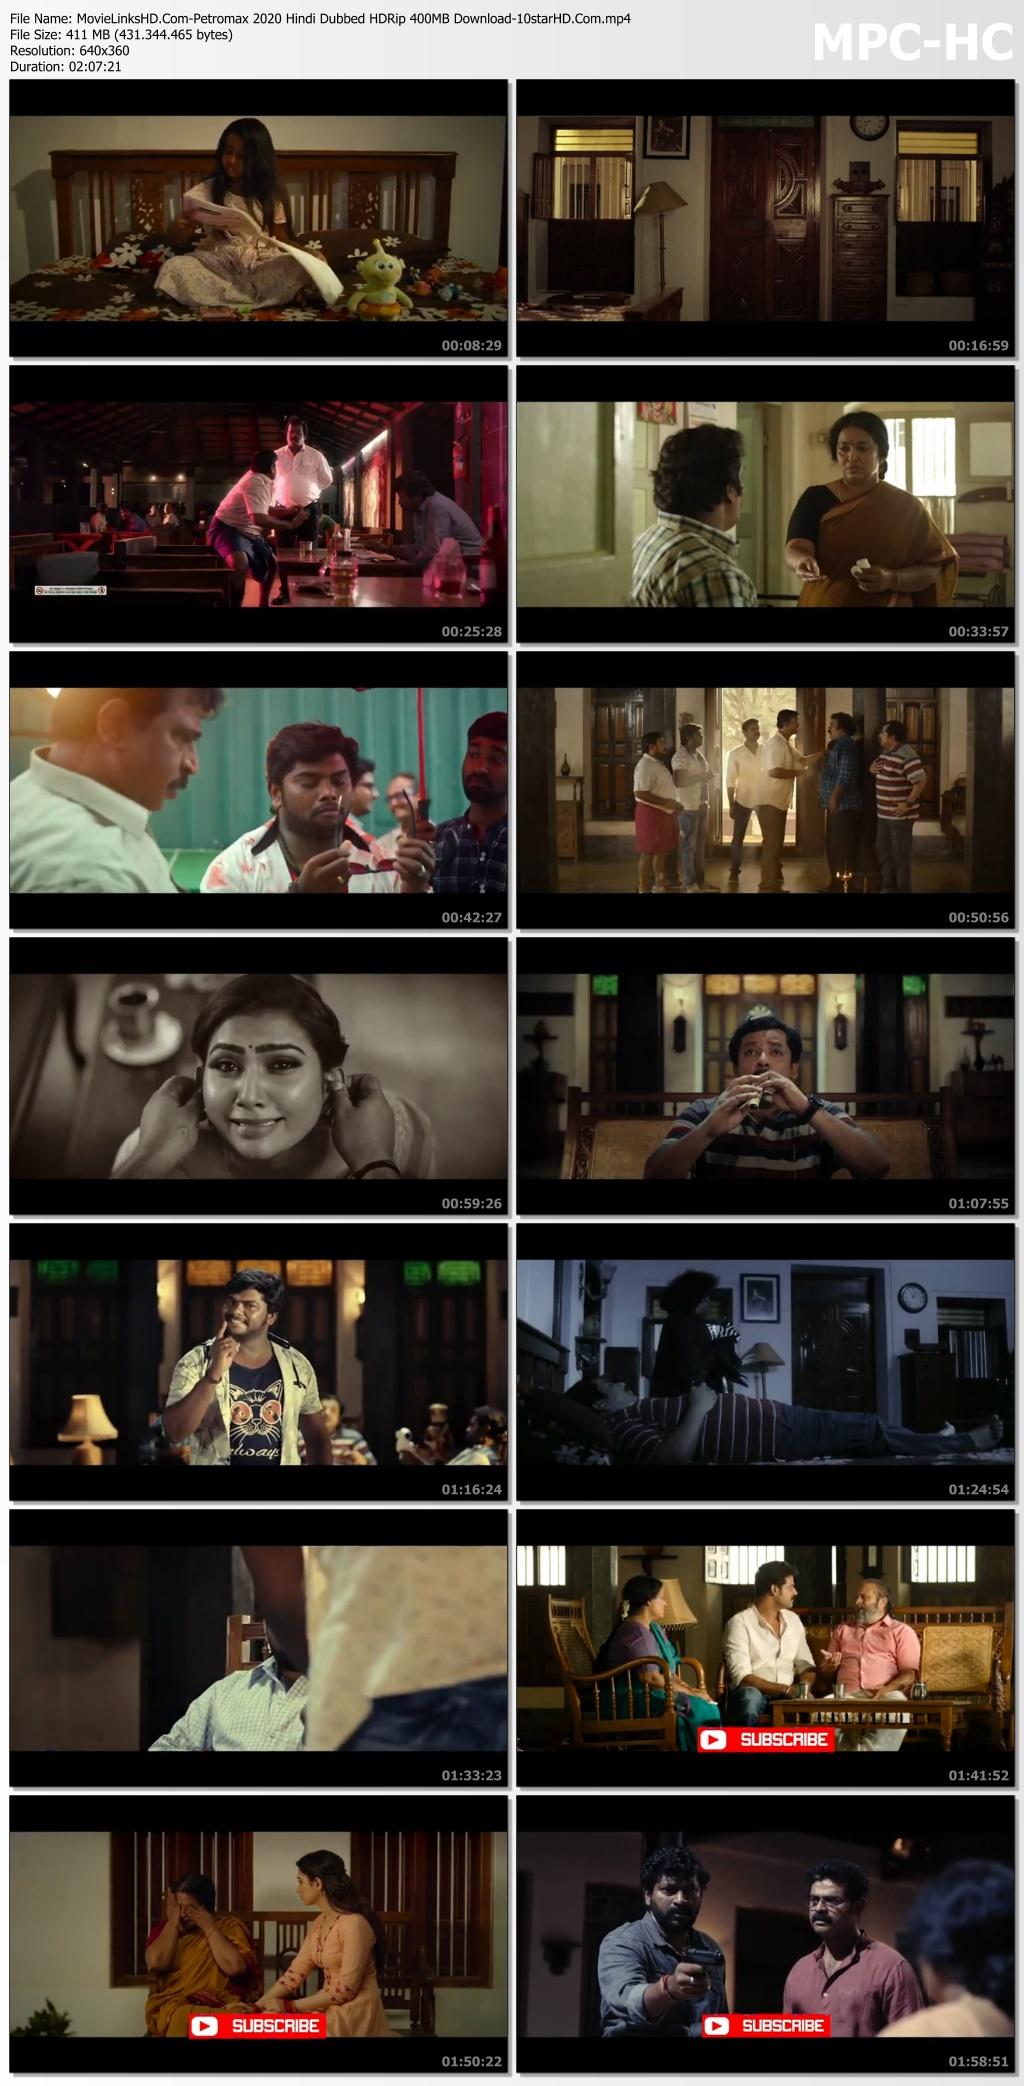 Movie-Links-HD-Com-Petromax-2020-Hindi-Dubbed-HDRip-400-MB-Download-10star-HD-Com-mp4-thumbs